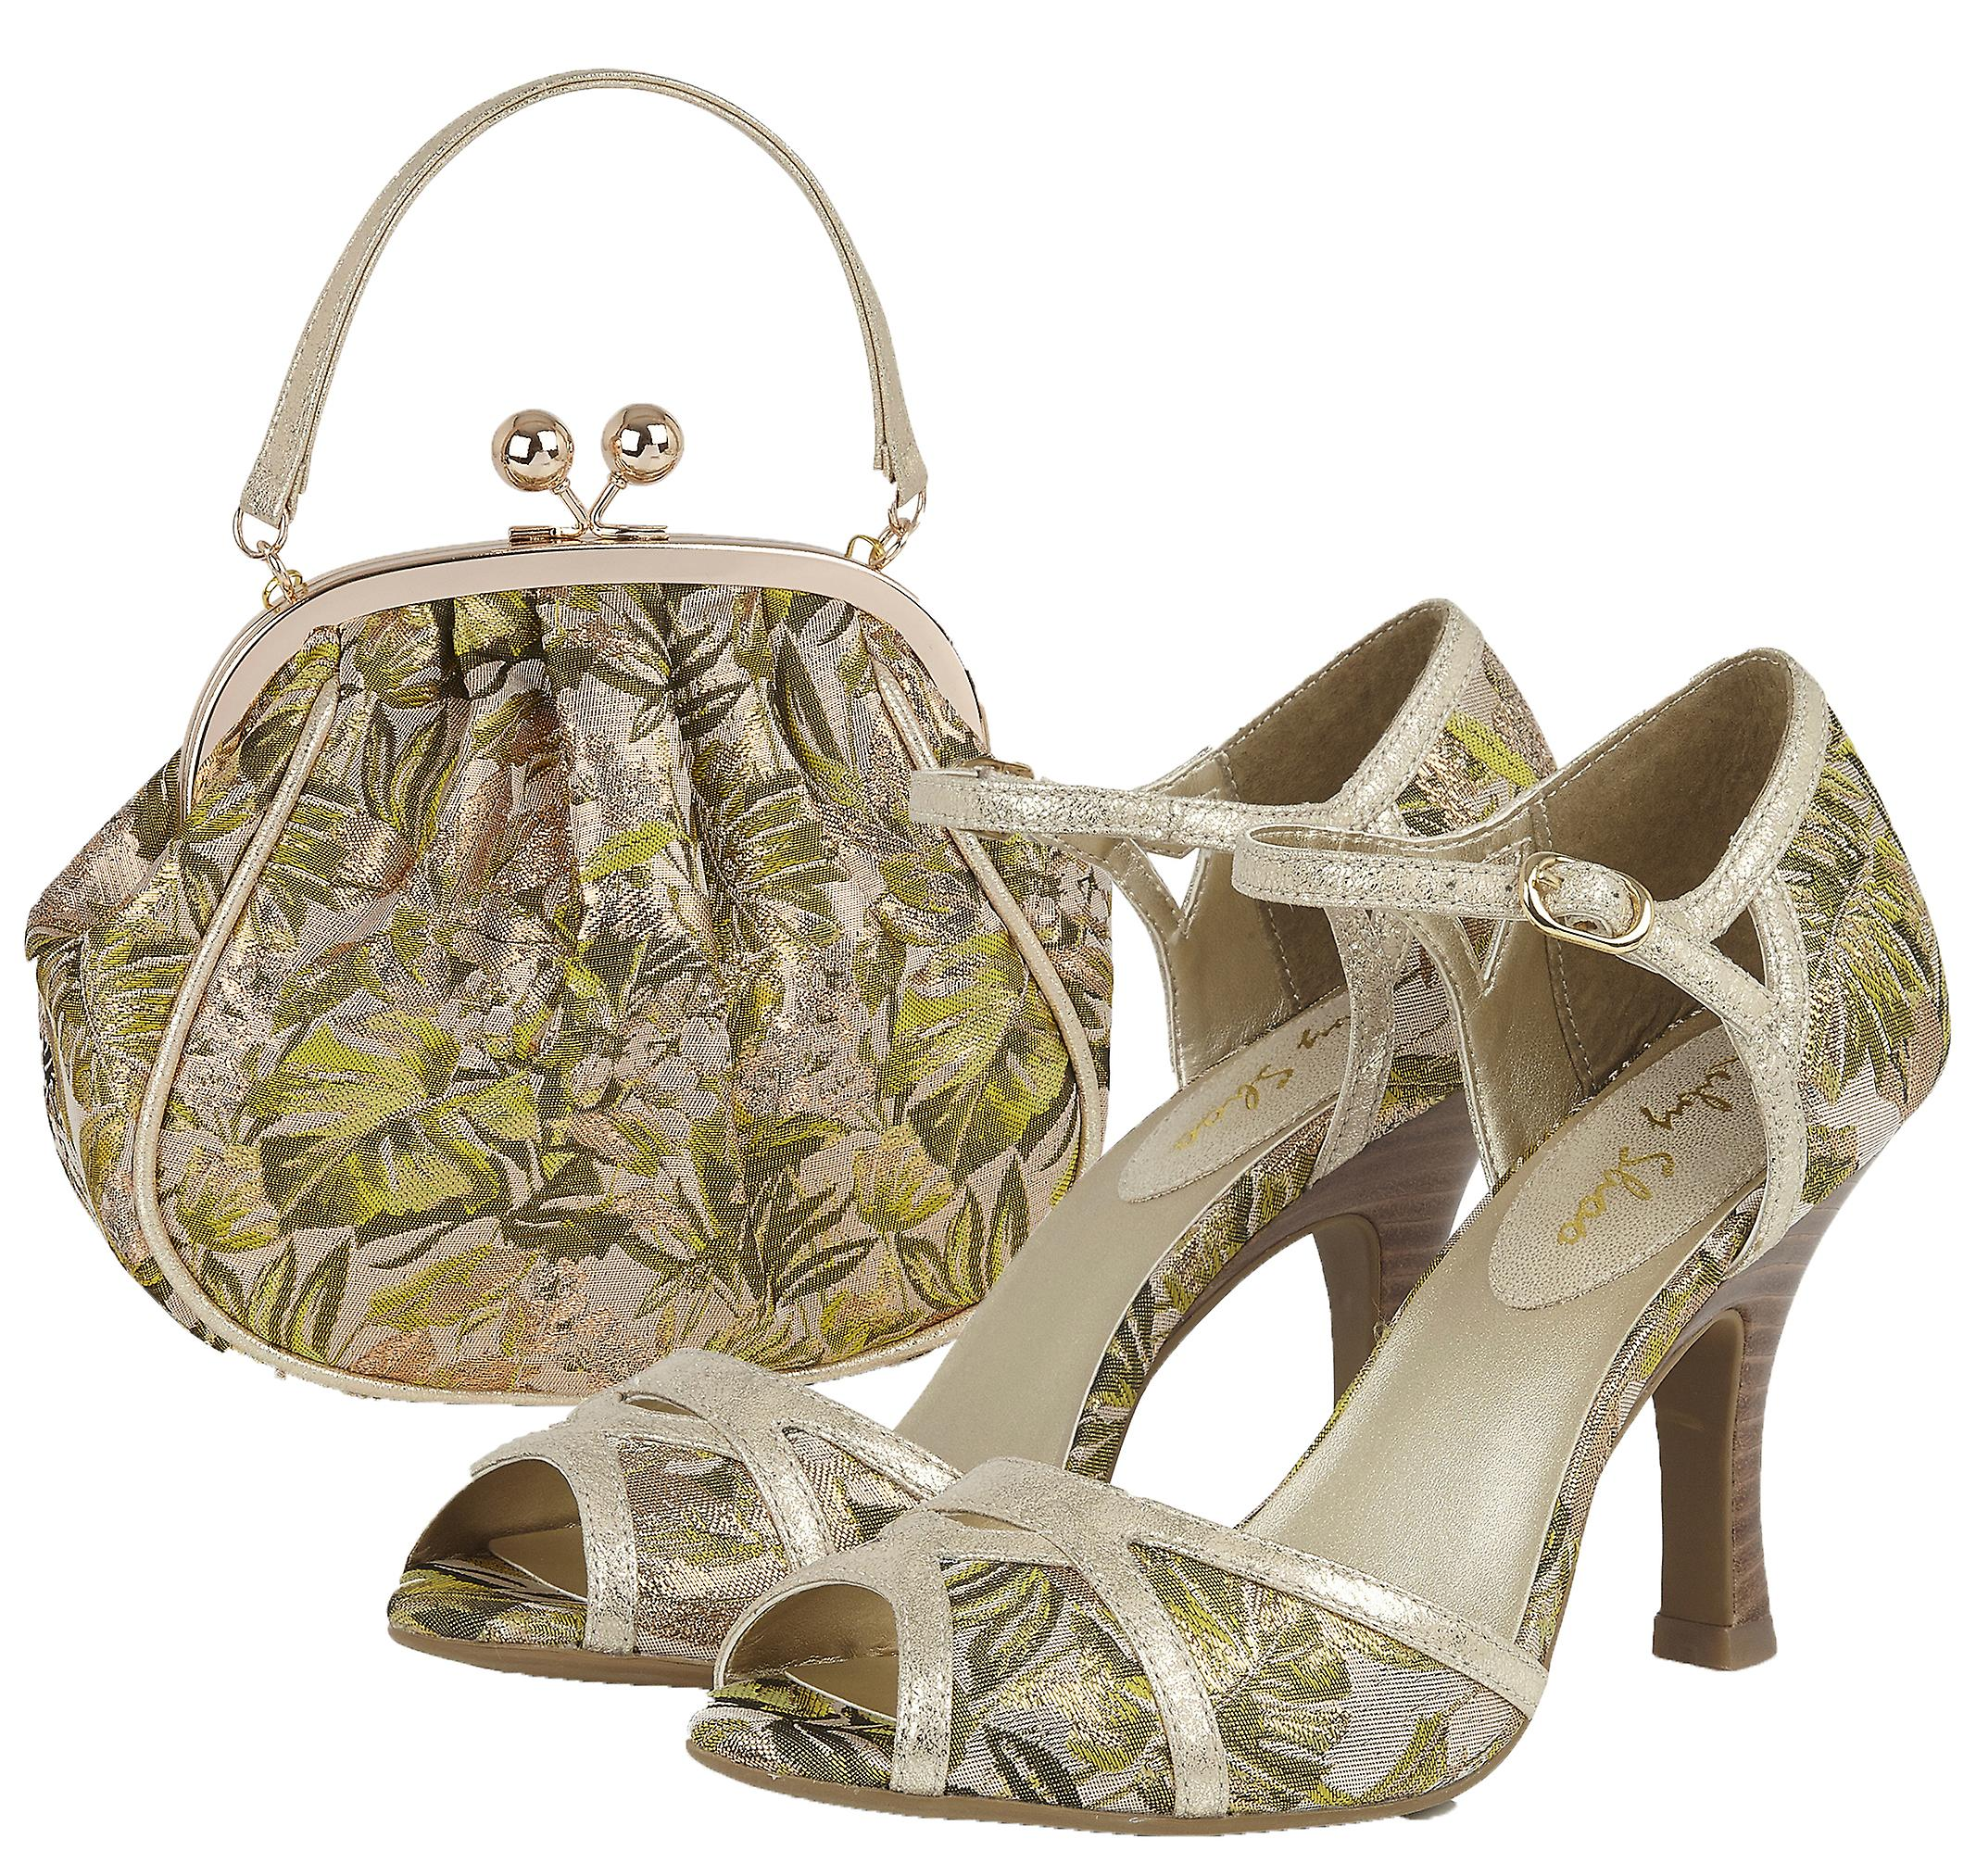 Ruby Shoo Women's Eliza Peeptoe Occasion Sandals & Matching Arco Bag